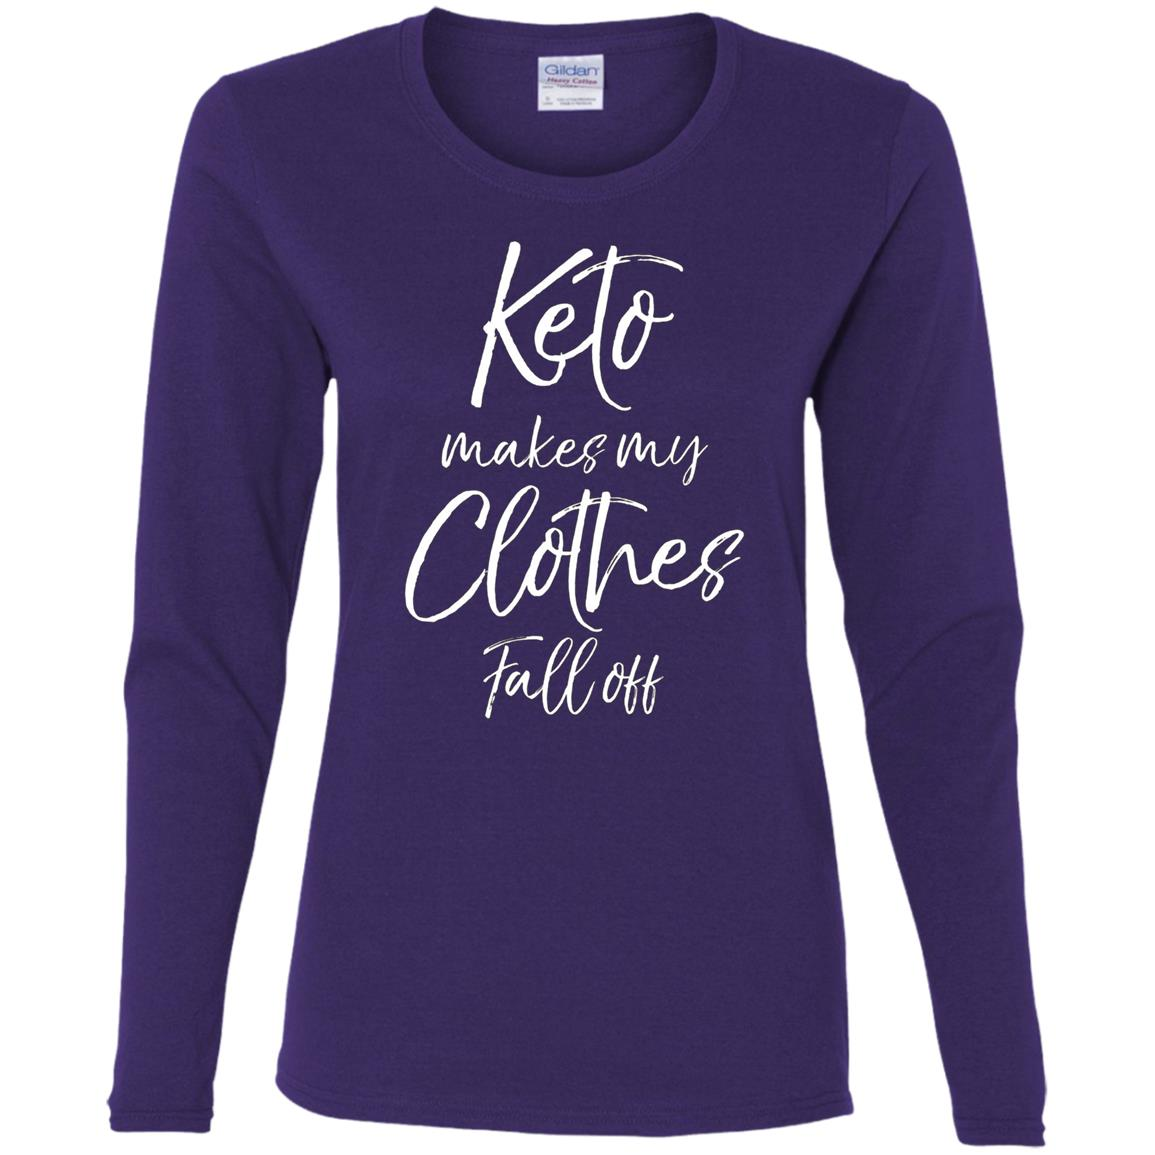 Keto Makes My Clothes Fall Off Fun Cute Ketones Tee Women Long Sleeve T-Shirt